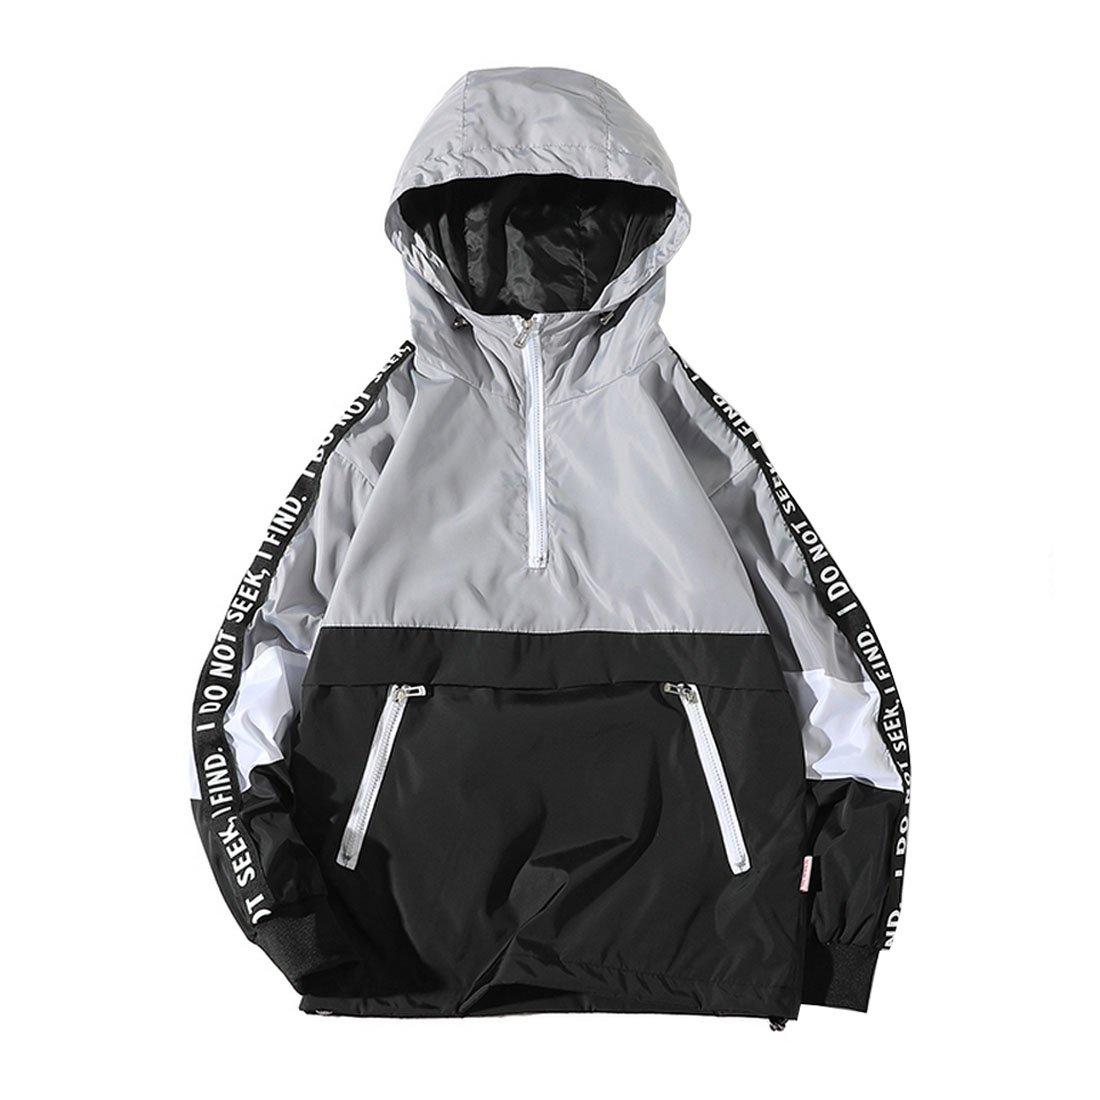 Hzcx Fashion Mens Pullover Hooded Waterproof Lightweight Windbreaker Jackets(Grey,S) by Hzcx Fashion